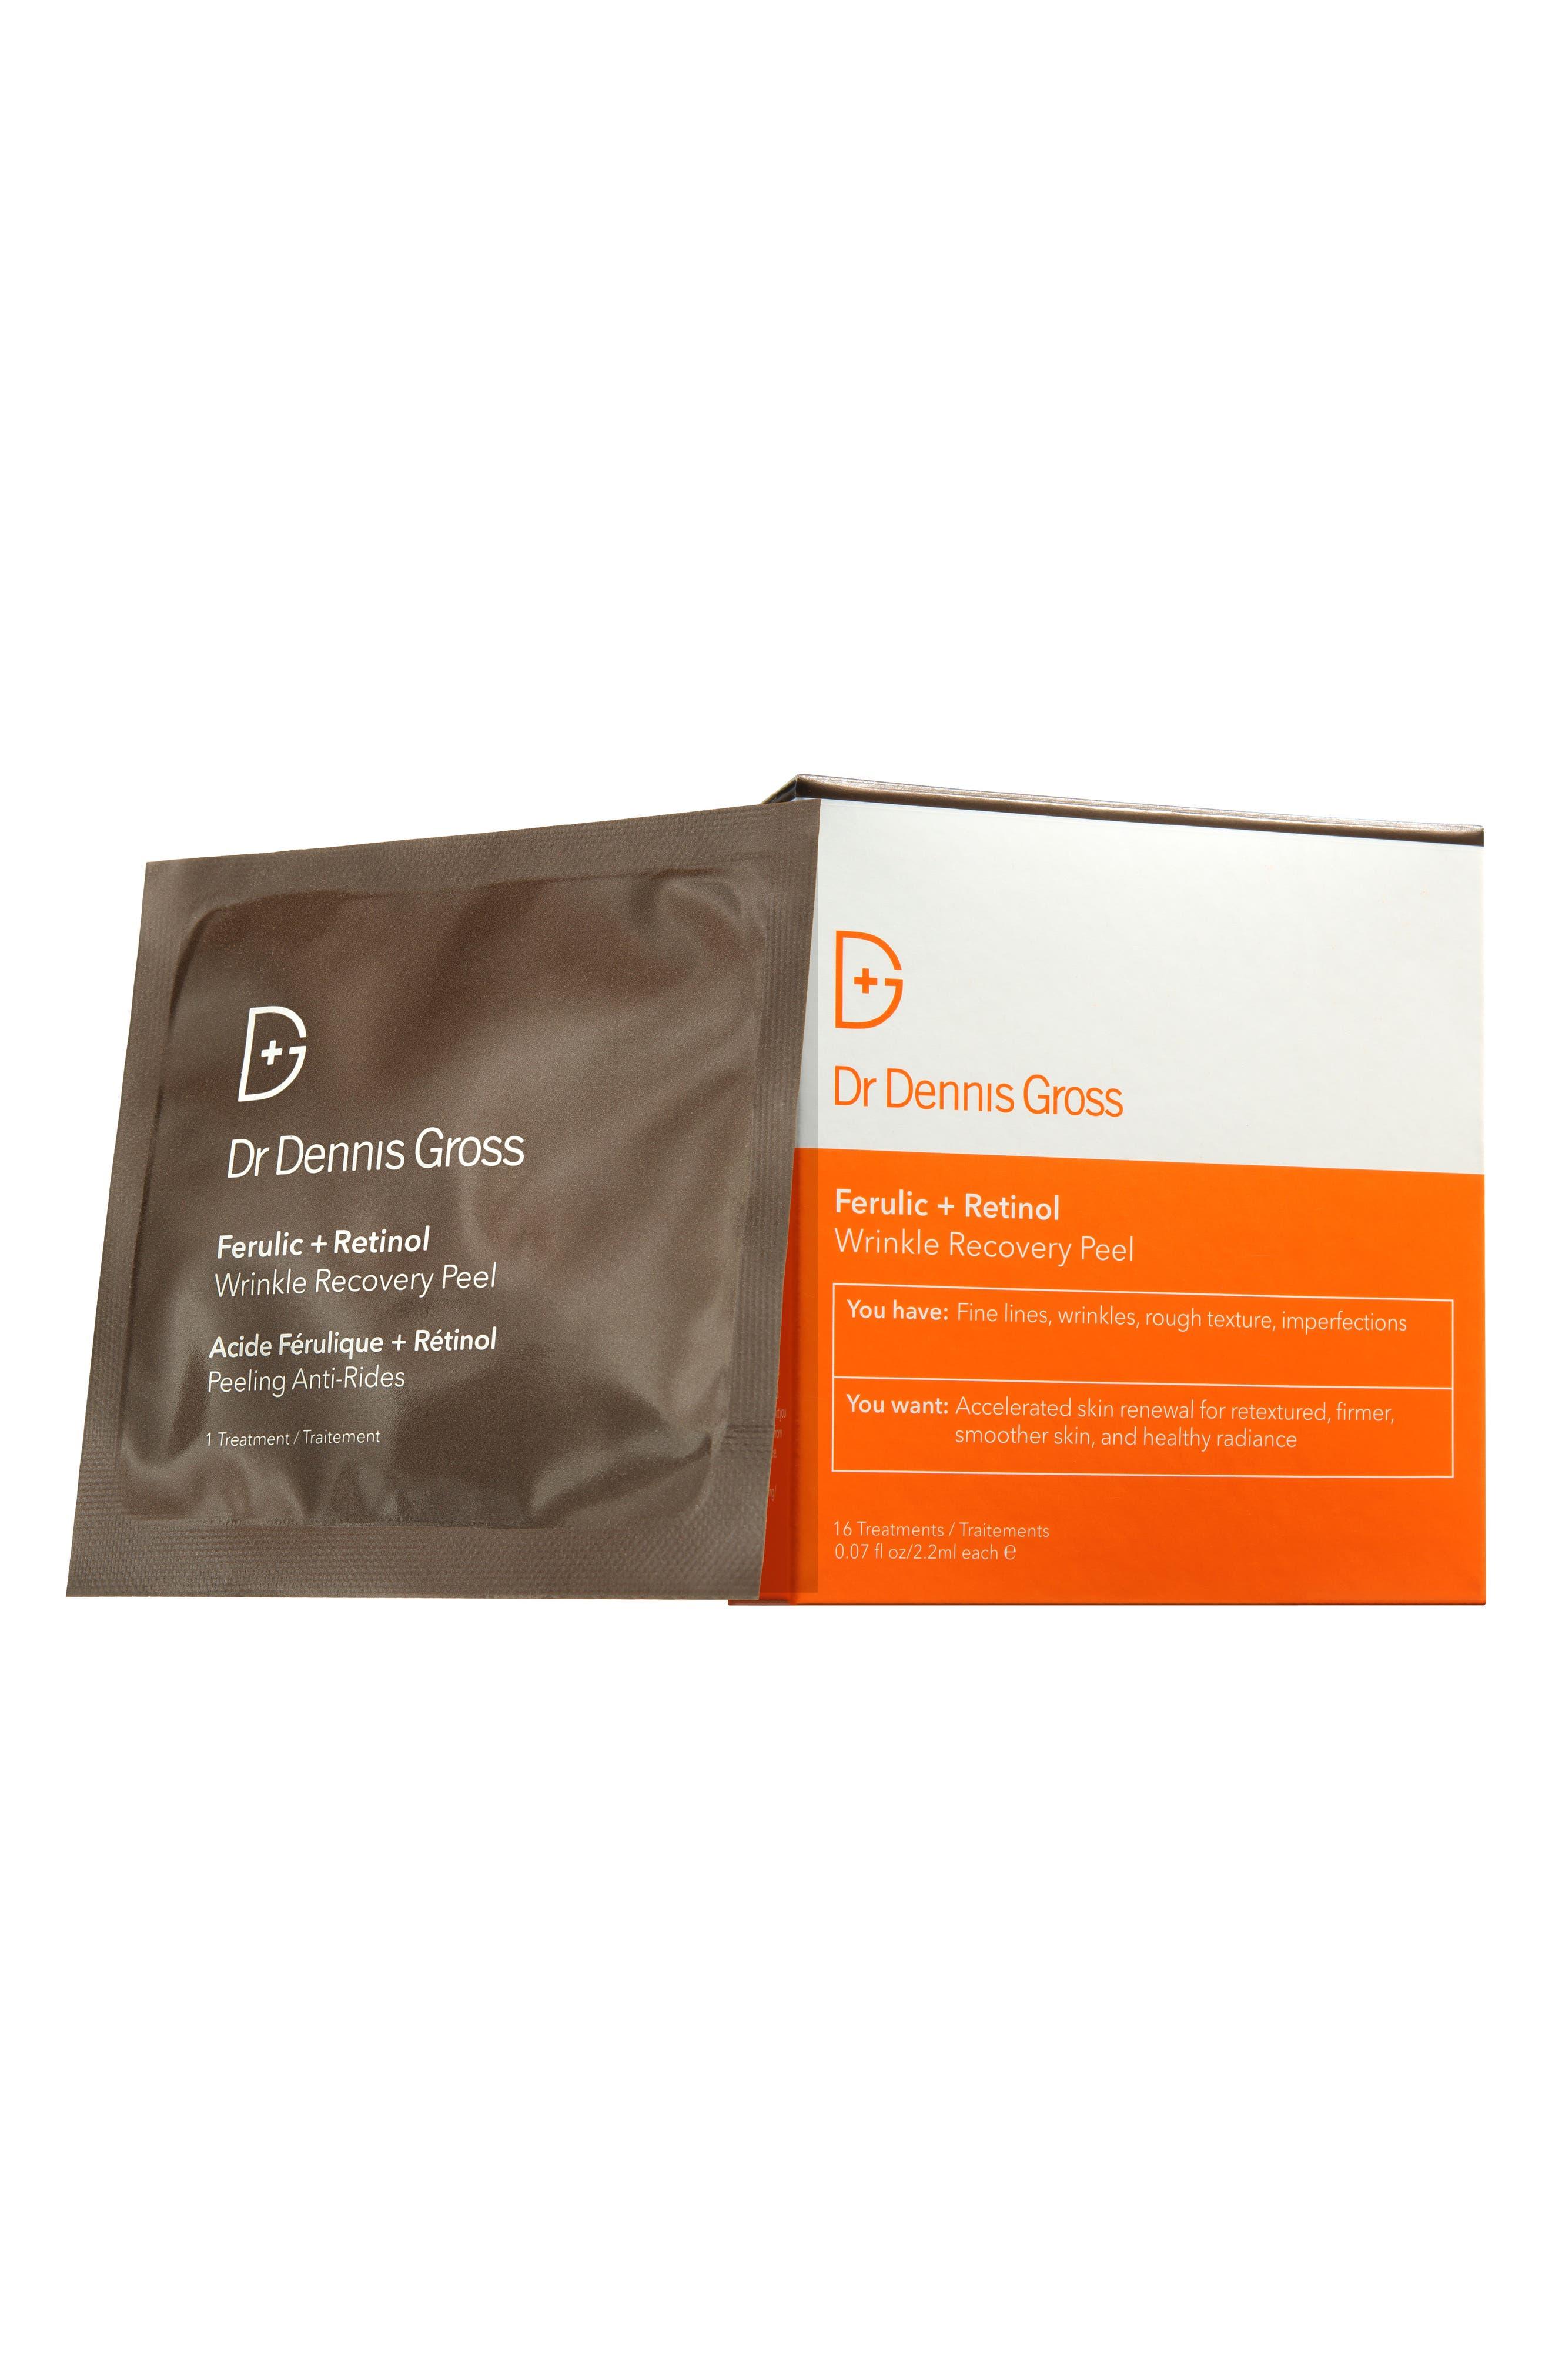 Skincare Ferulic + Retinol Wrinkle Recovery Peel